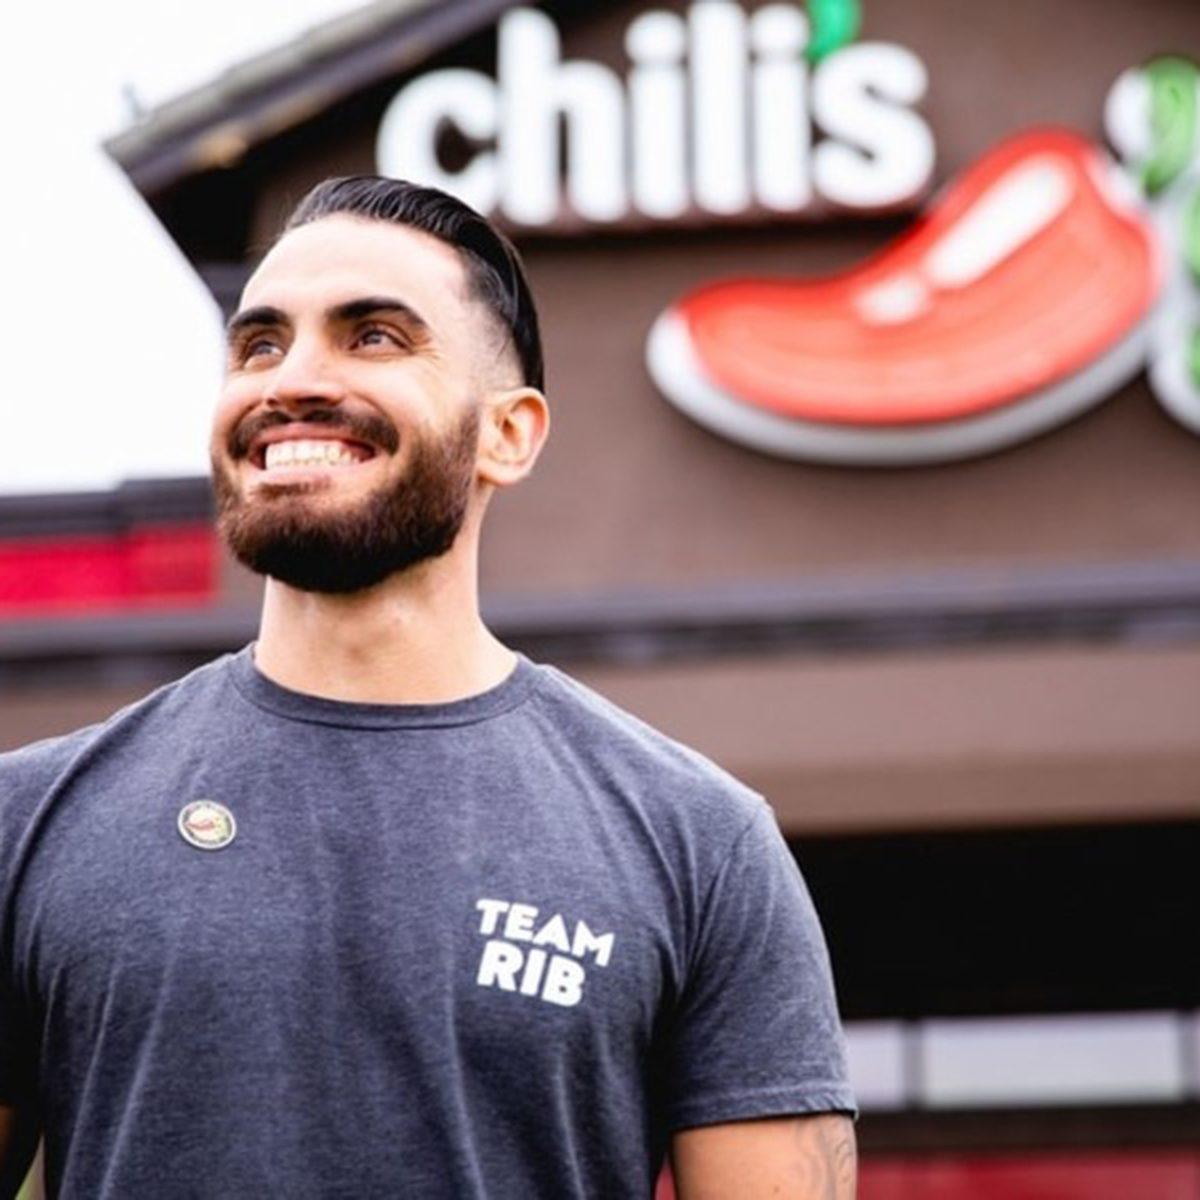 Chili's exterior